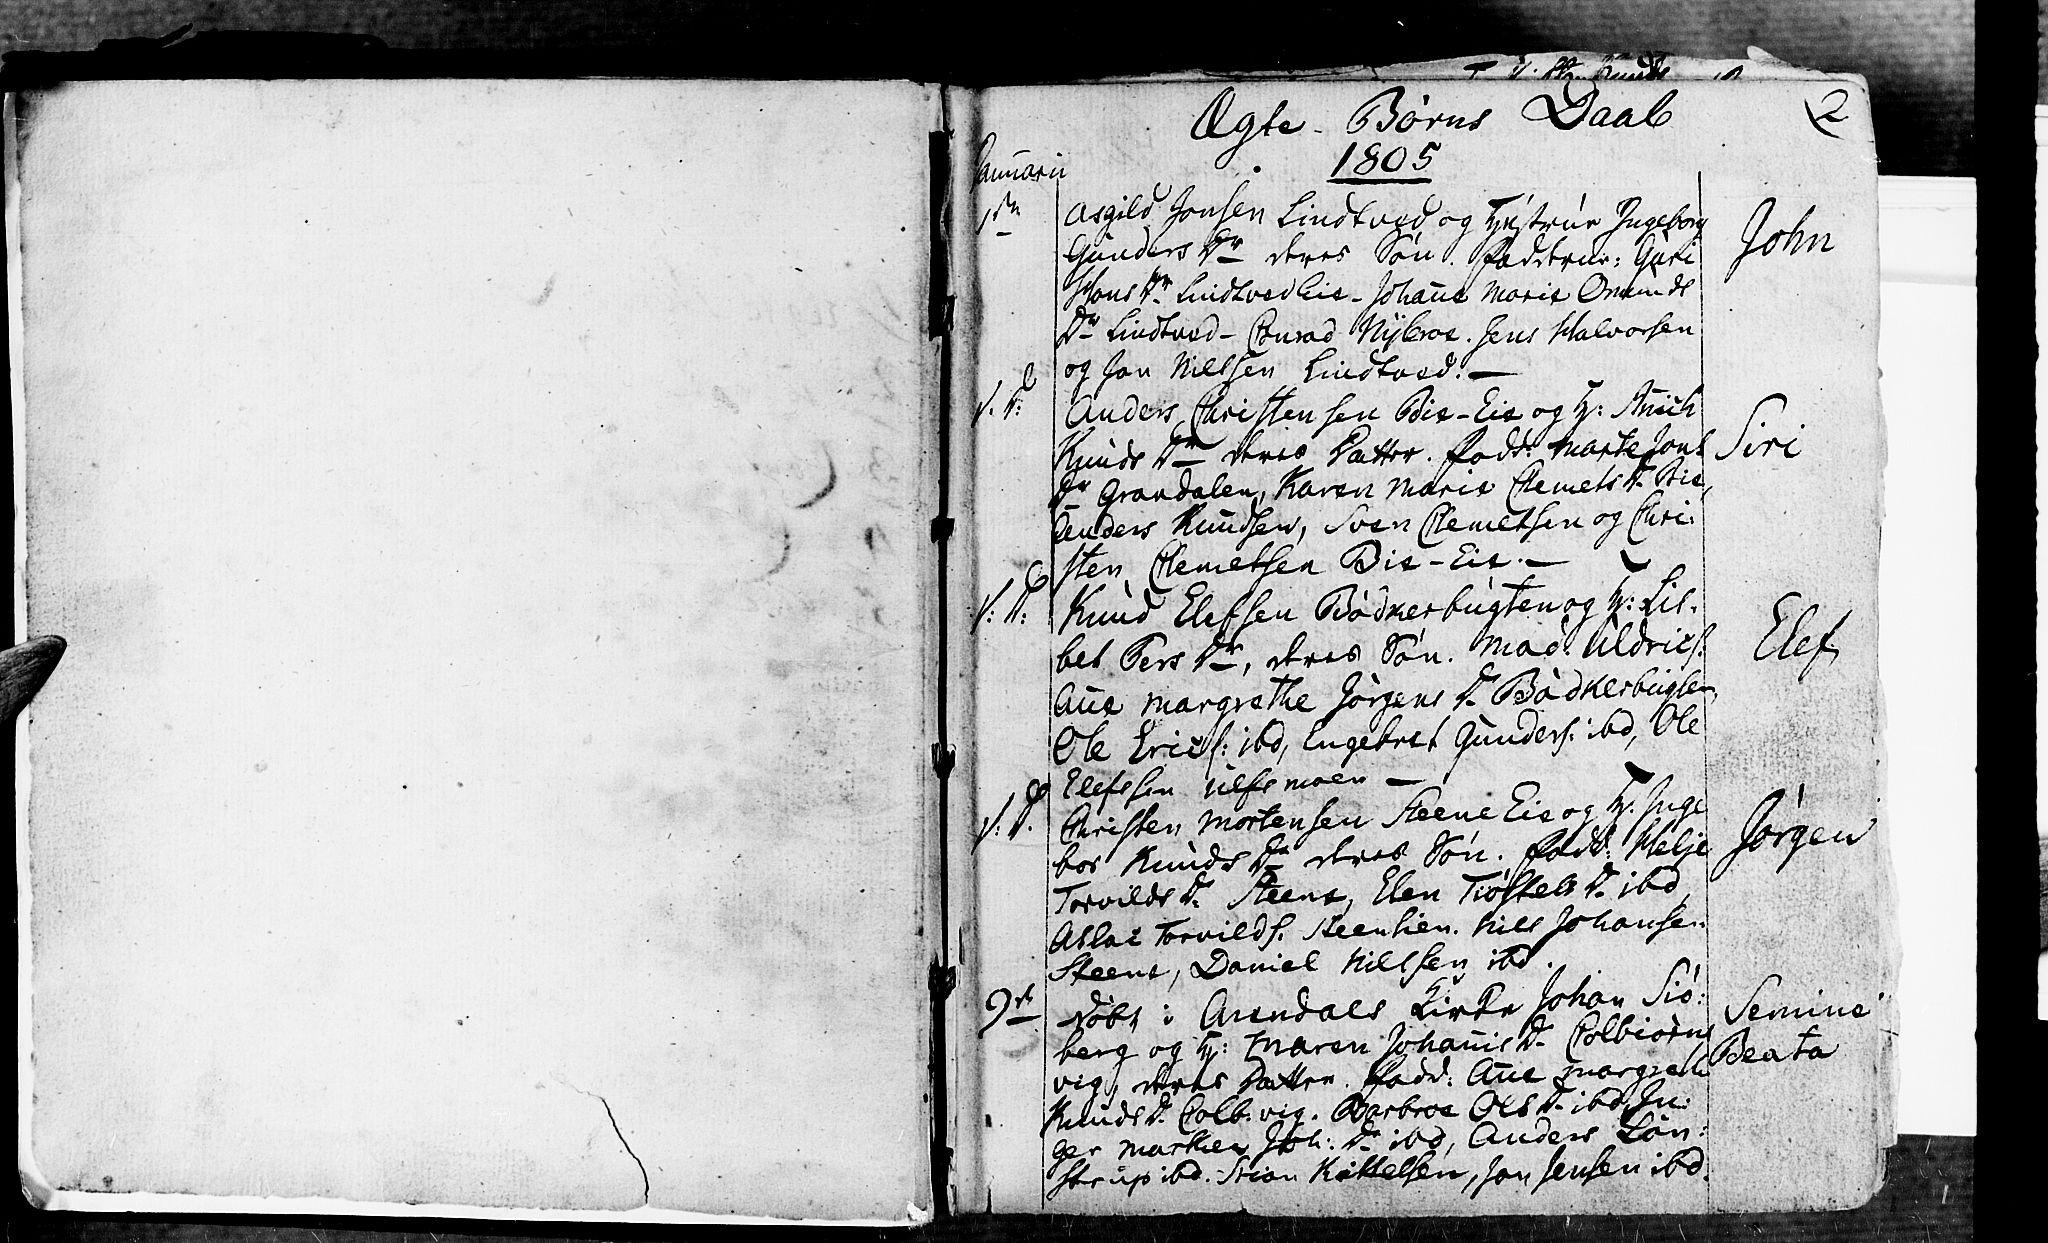 SAK, Øyestad sokneprestkontor, F/Fa/L0011: Ministerialbok nr. A 11, 1805-1824, s. 2